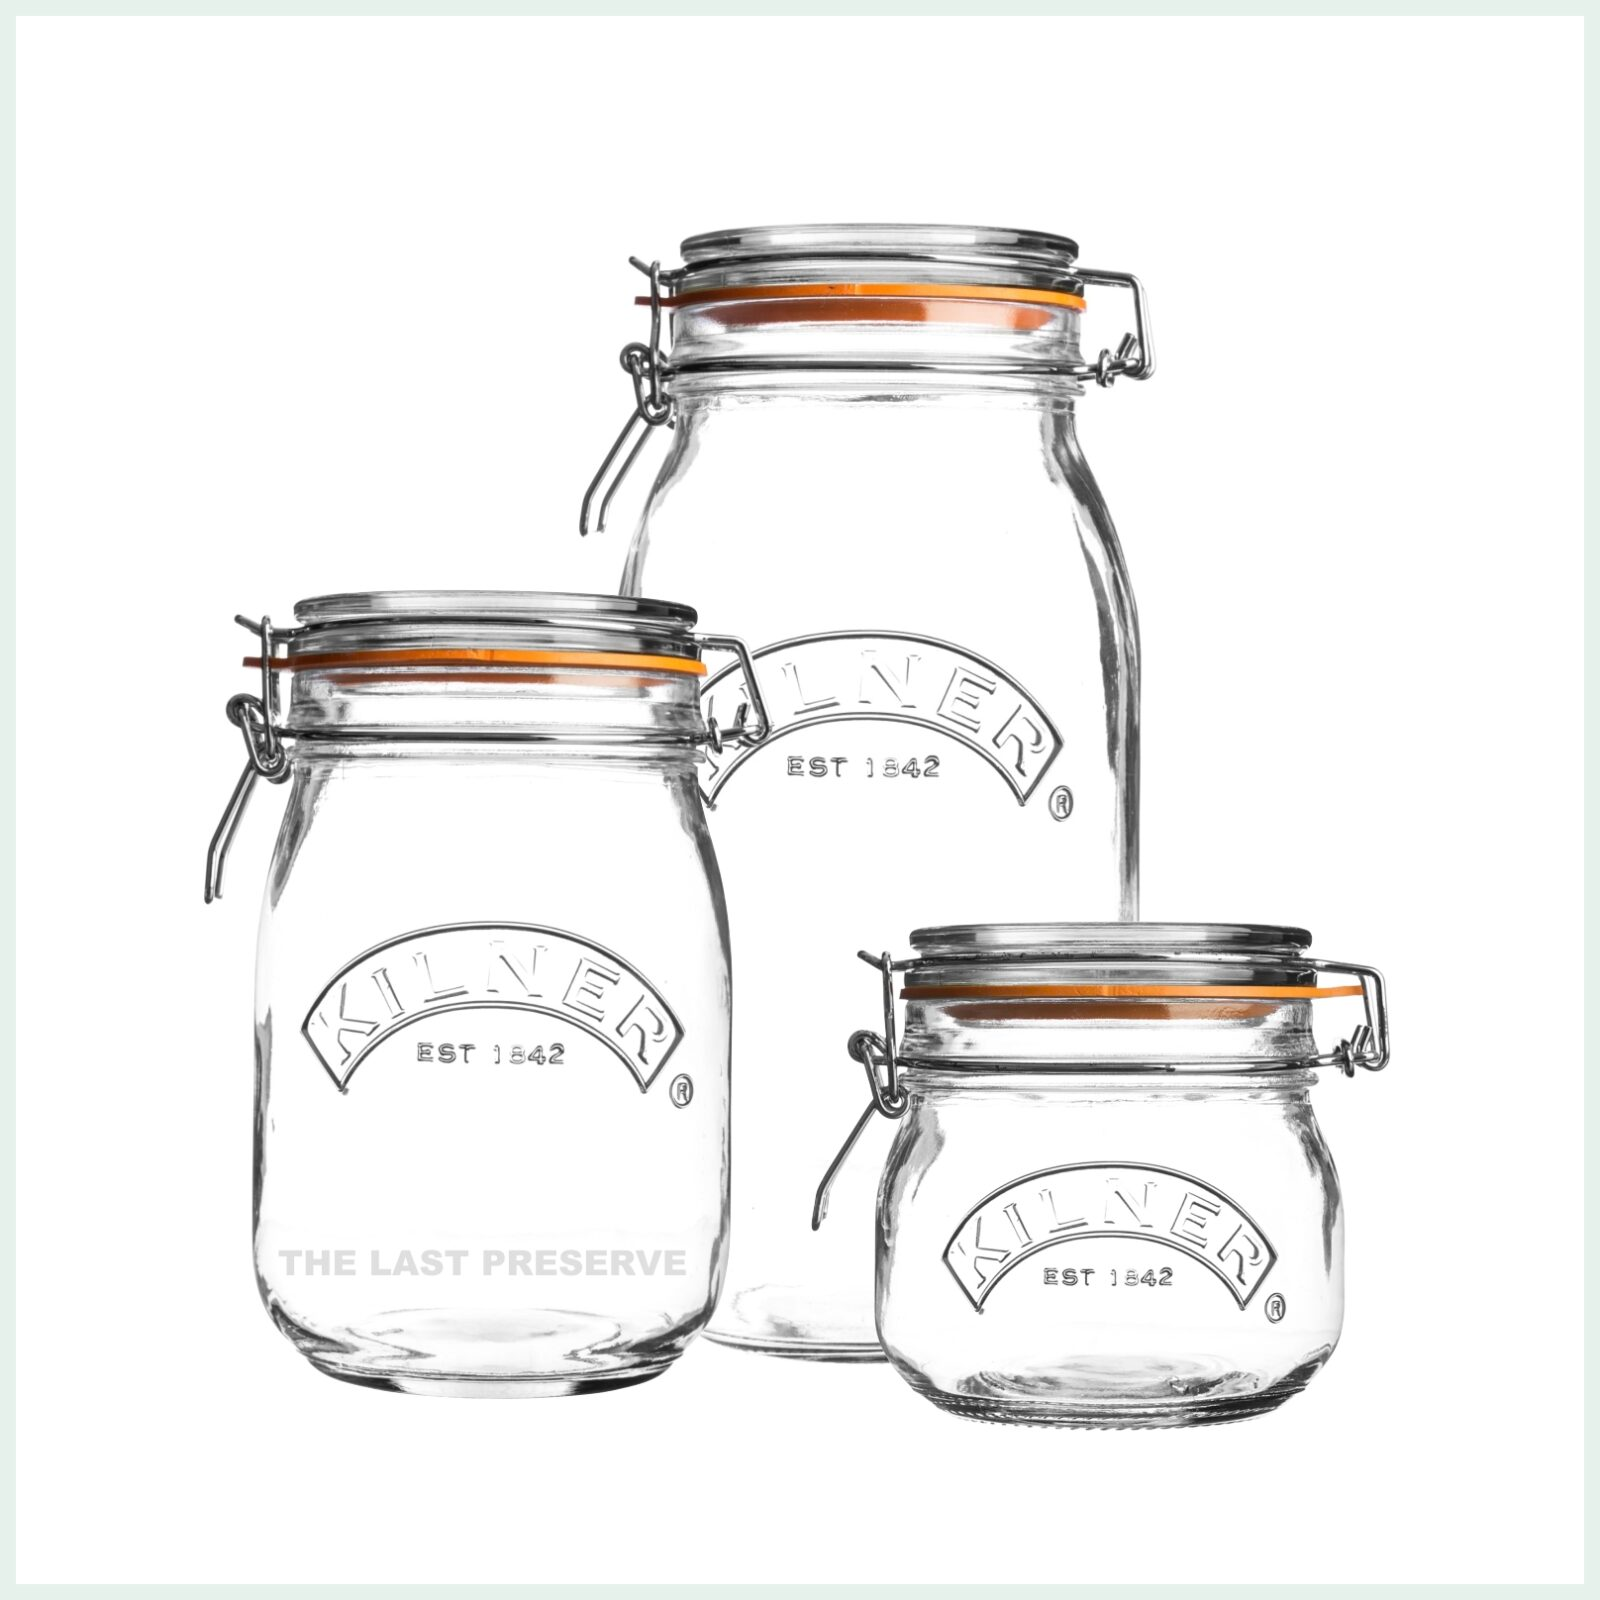 Kilner clip top jars for preserving, jam making and canning